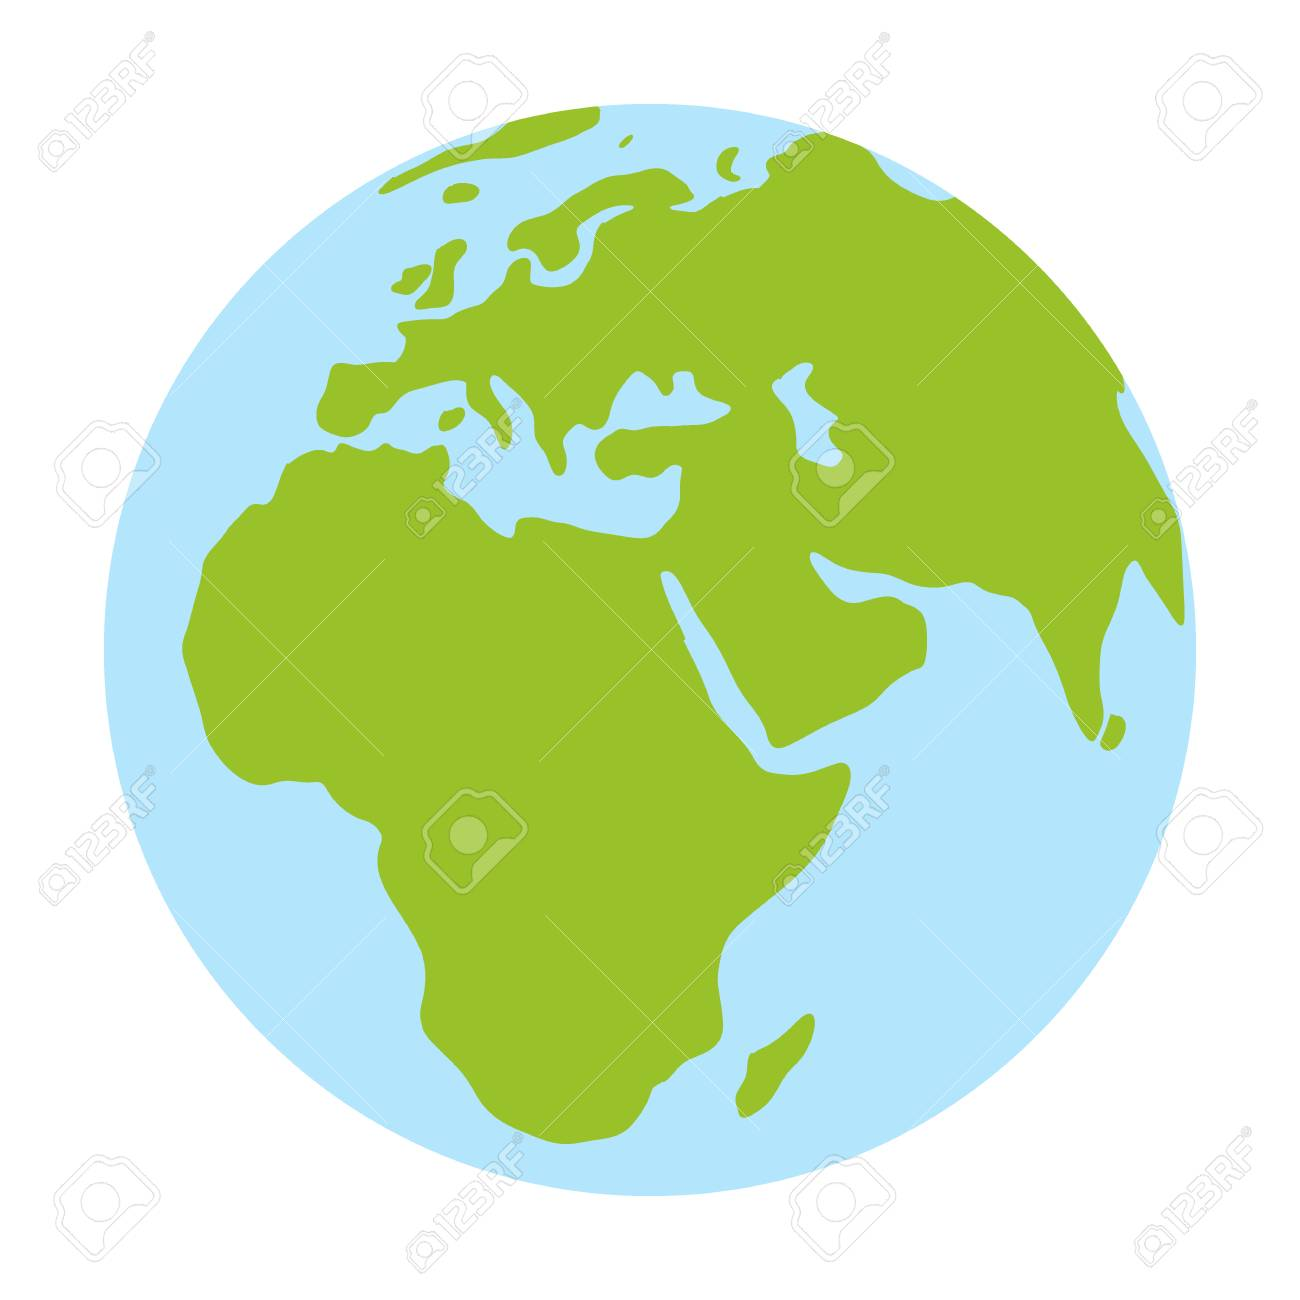 world globe icon vector earth logo royalty free cliparts vectors rh 123rf com vector earth logo vector earthquake